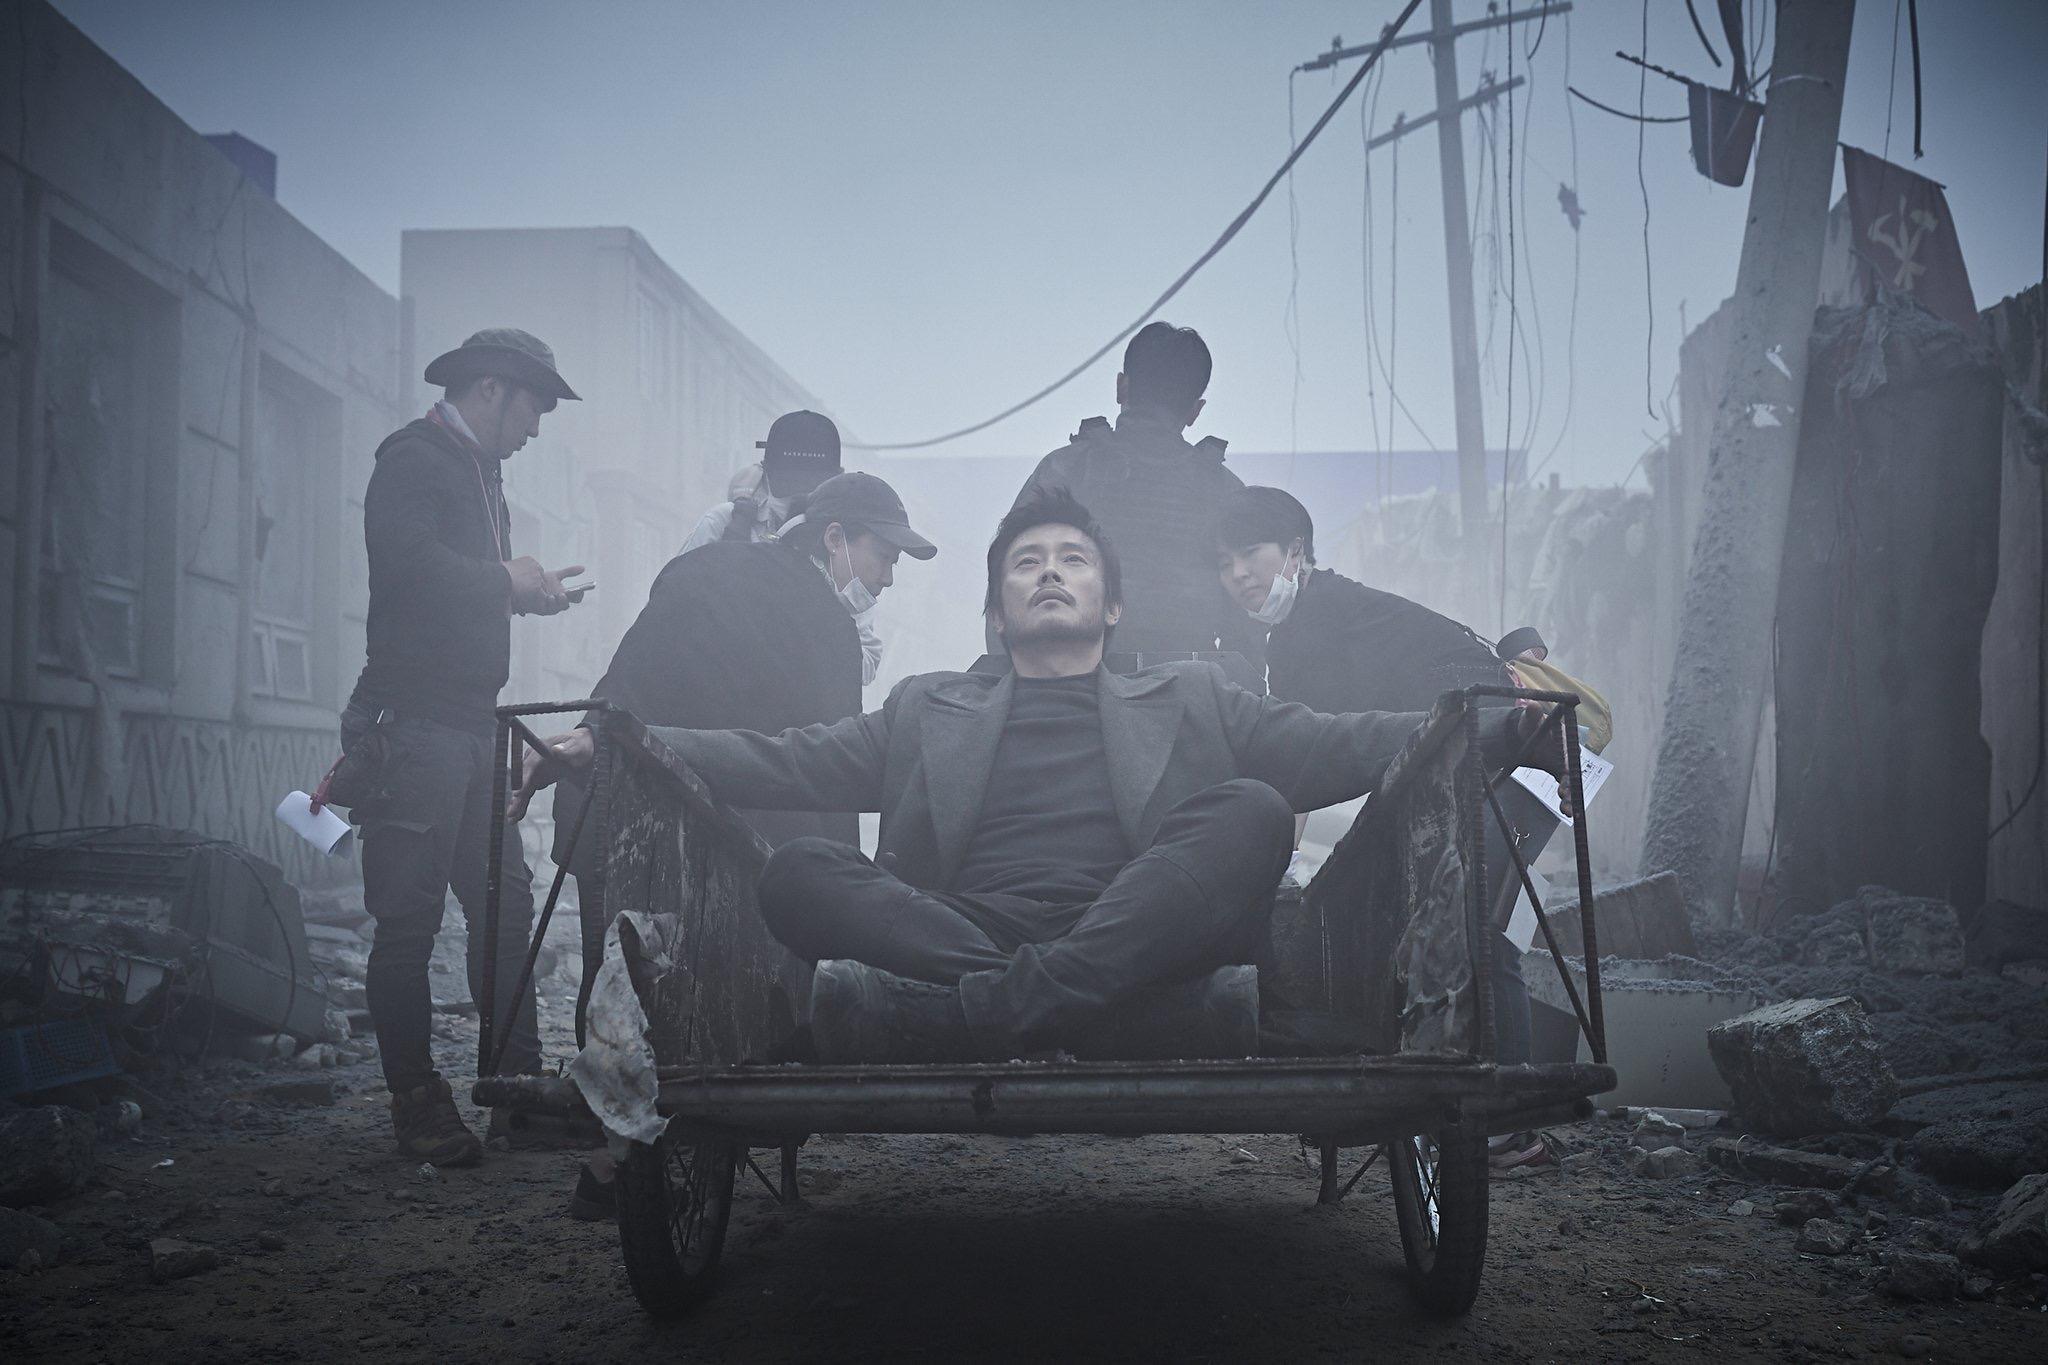 Lee Byung-Hun in Baekdusan (2019)